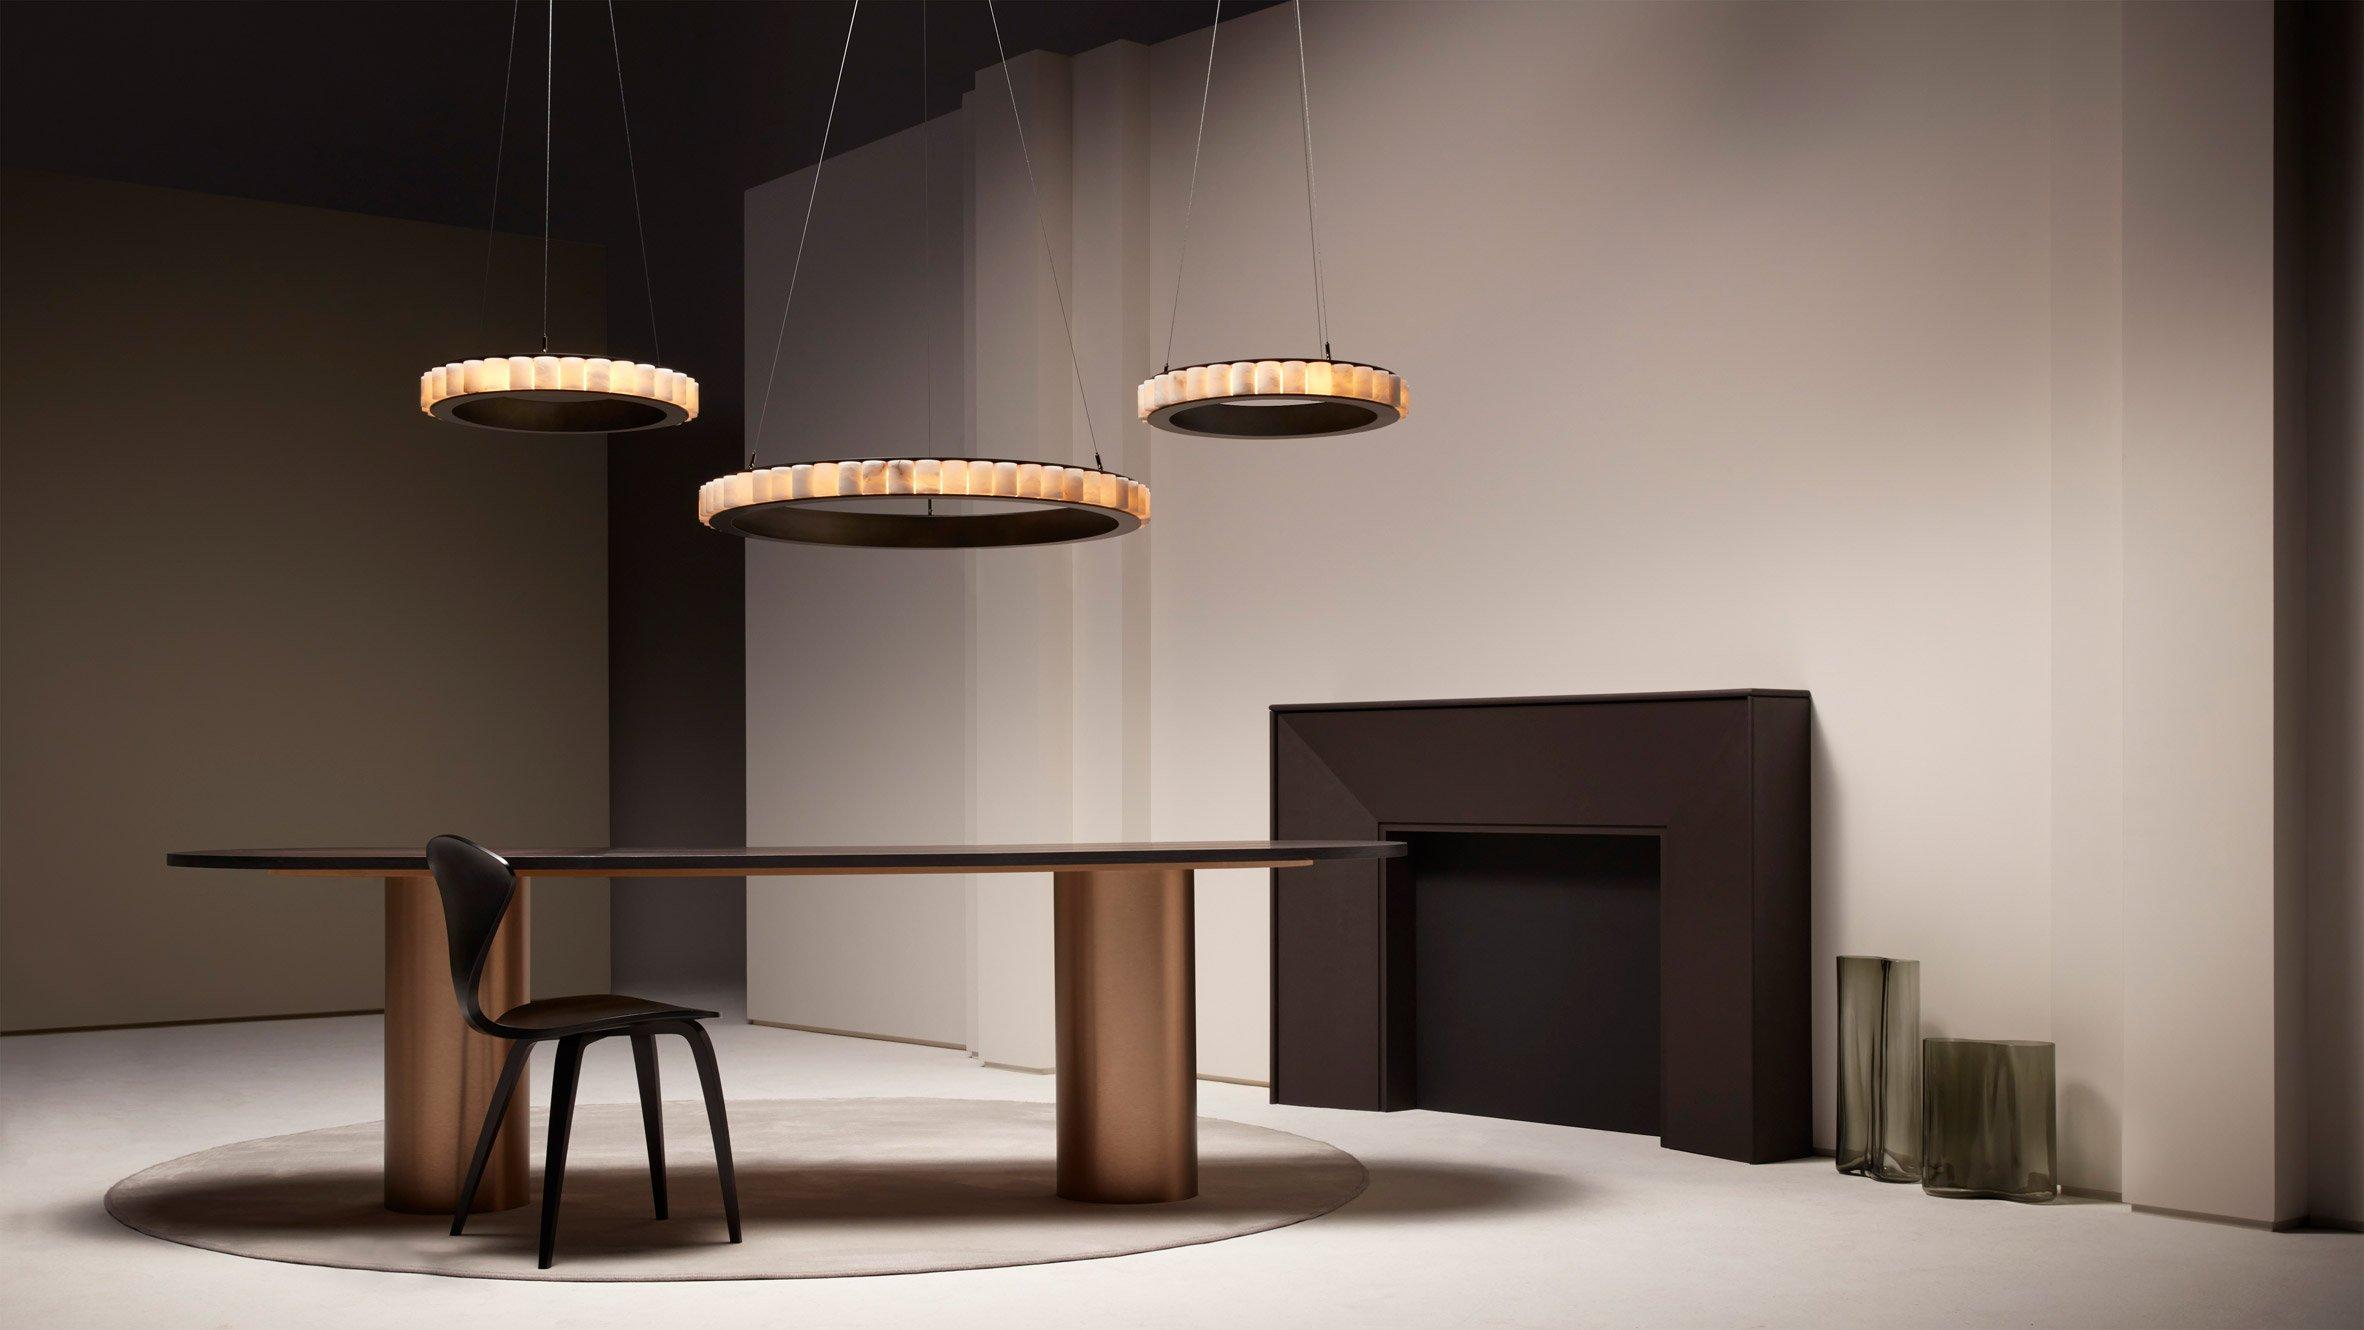 Three Avalon chandeliers in an interior